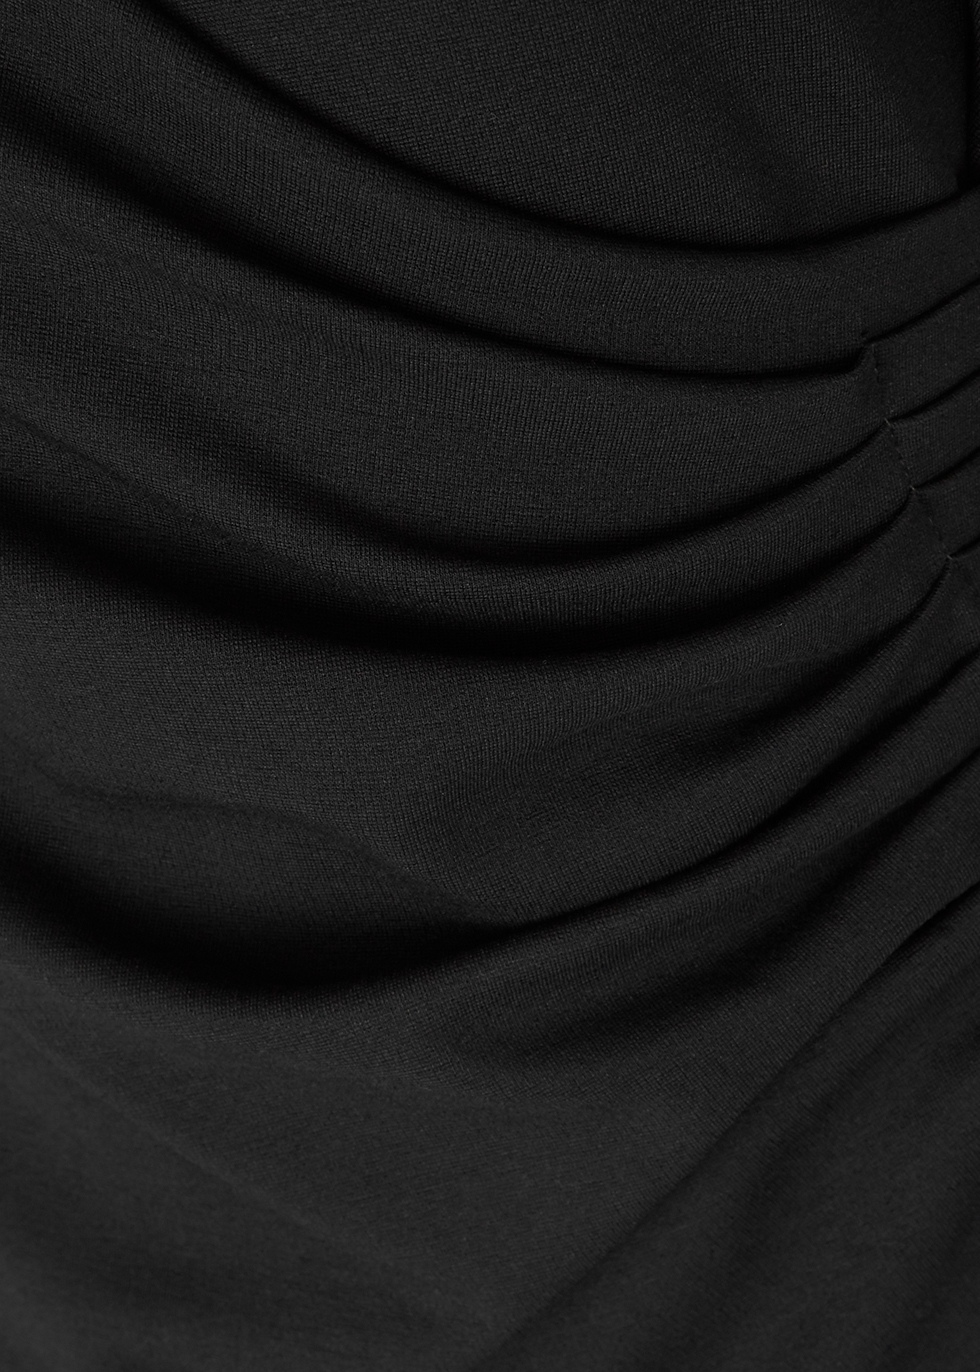 Black wrap-effect stretch-knit dress - Emporio Armani